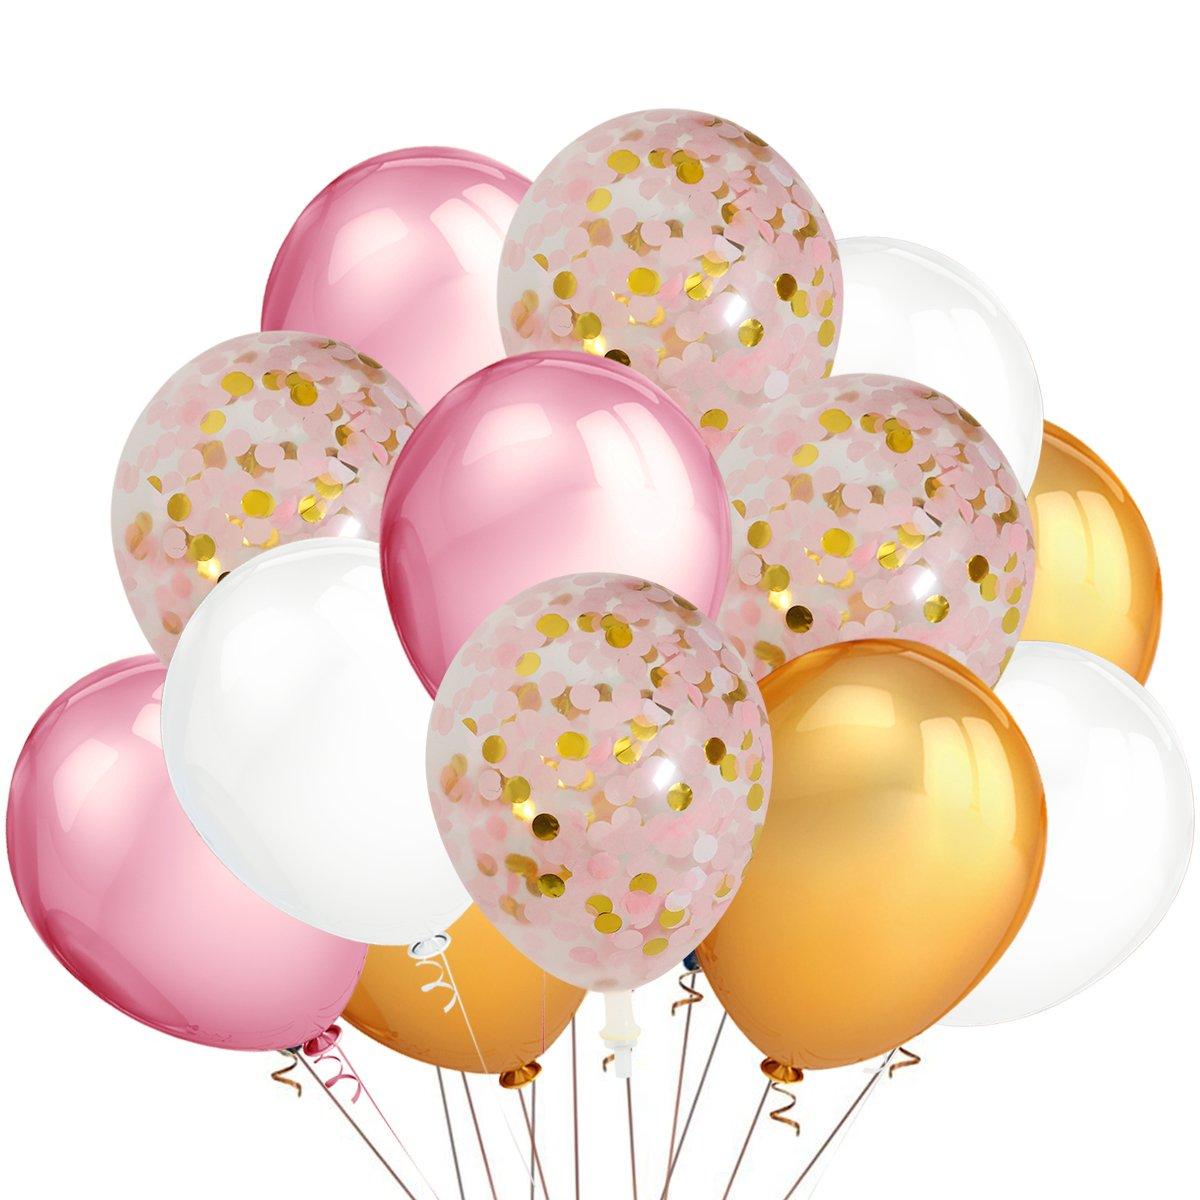 teepollyパーティーバルーン、30パックゴールド&ピンク&ホワイト色ラテックスバルーンと12パックゴールド&ピンク&ホワイト色紙吹雪balloons-bachelorette/ウェディング/ベビーシャワー/誕生日装飾   B07F1H69G3